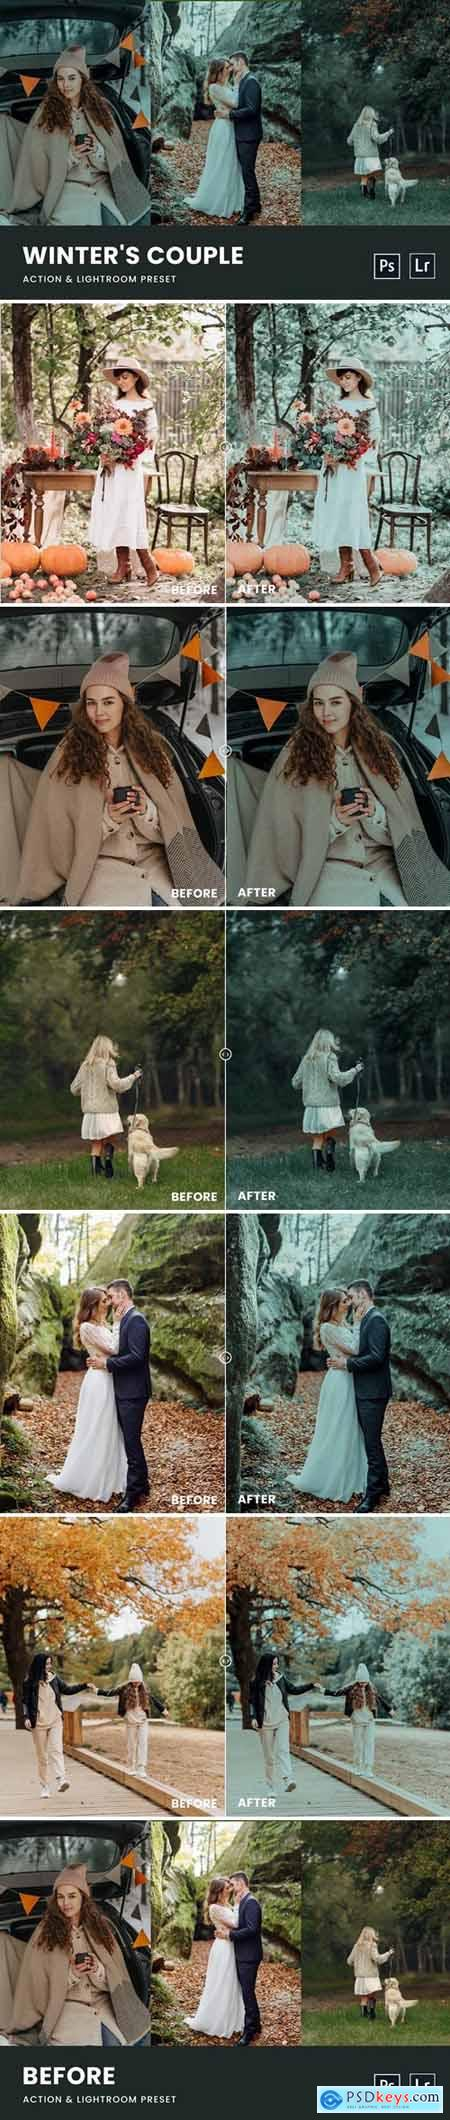 Winters Couple Photoshop Action & Lightrom Preset